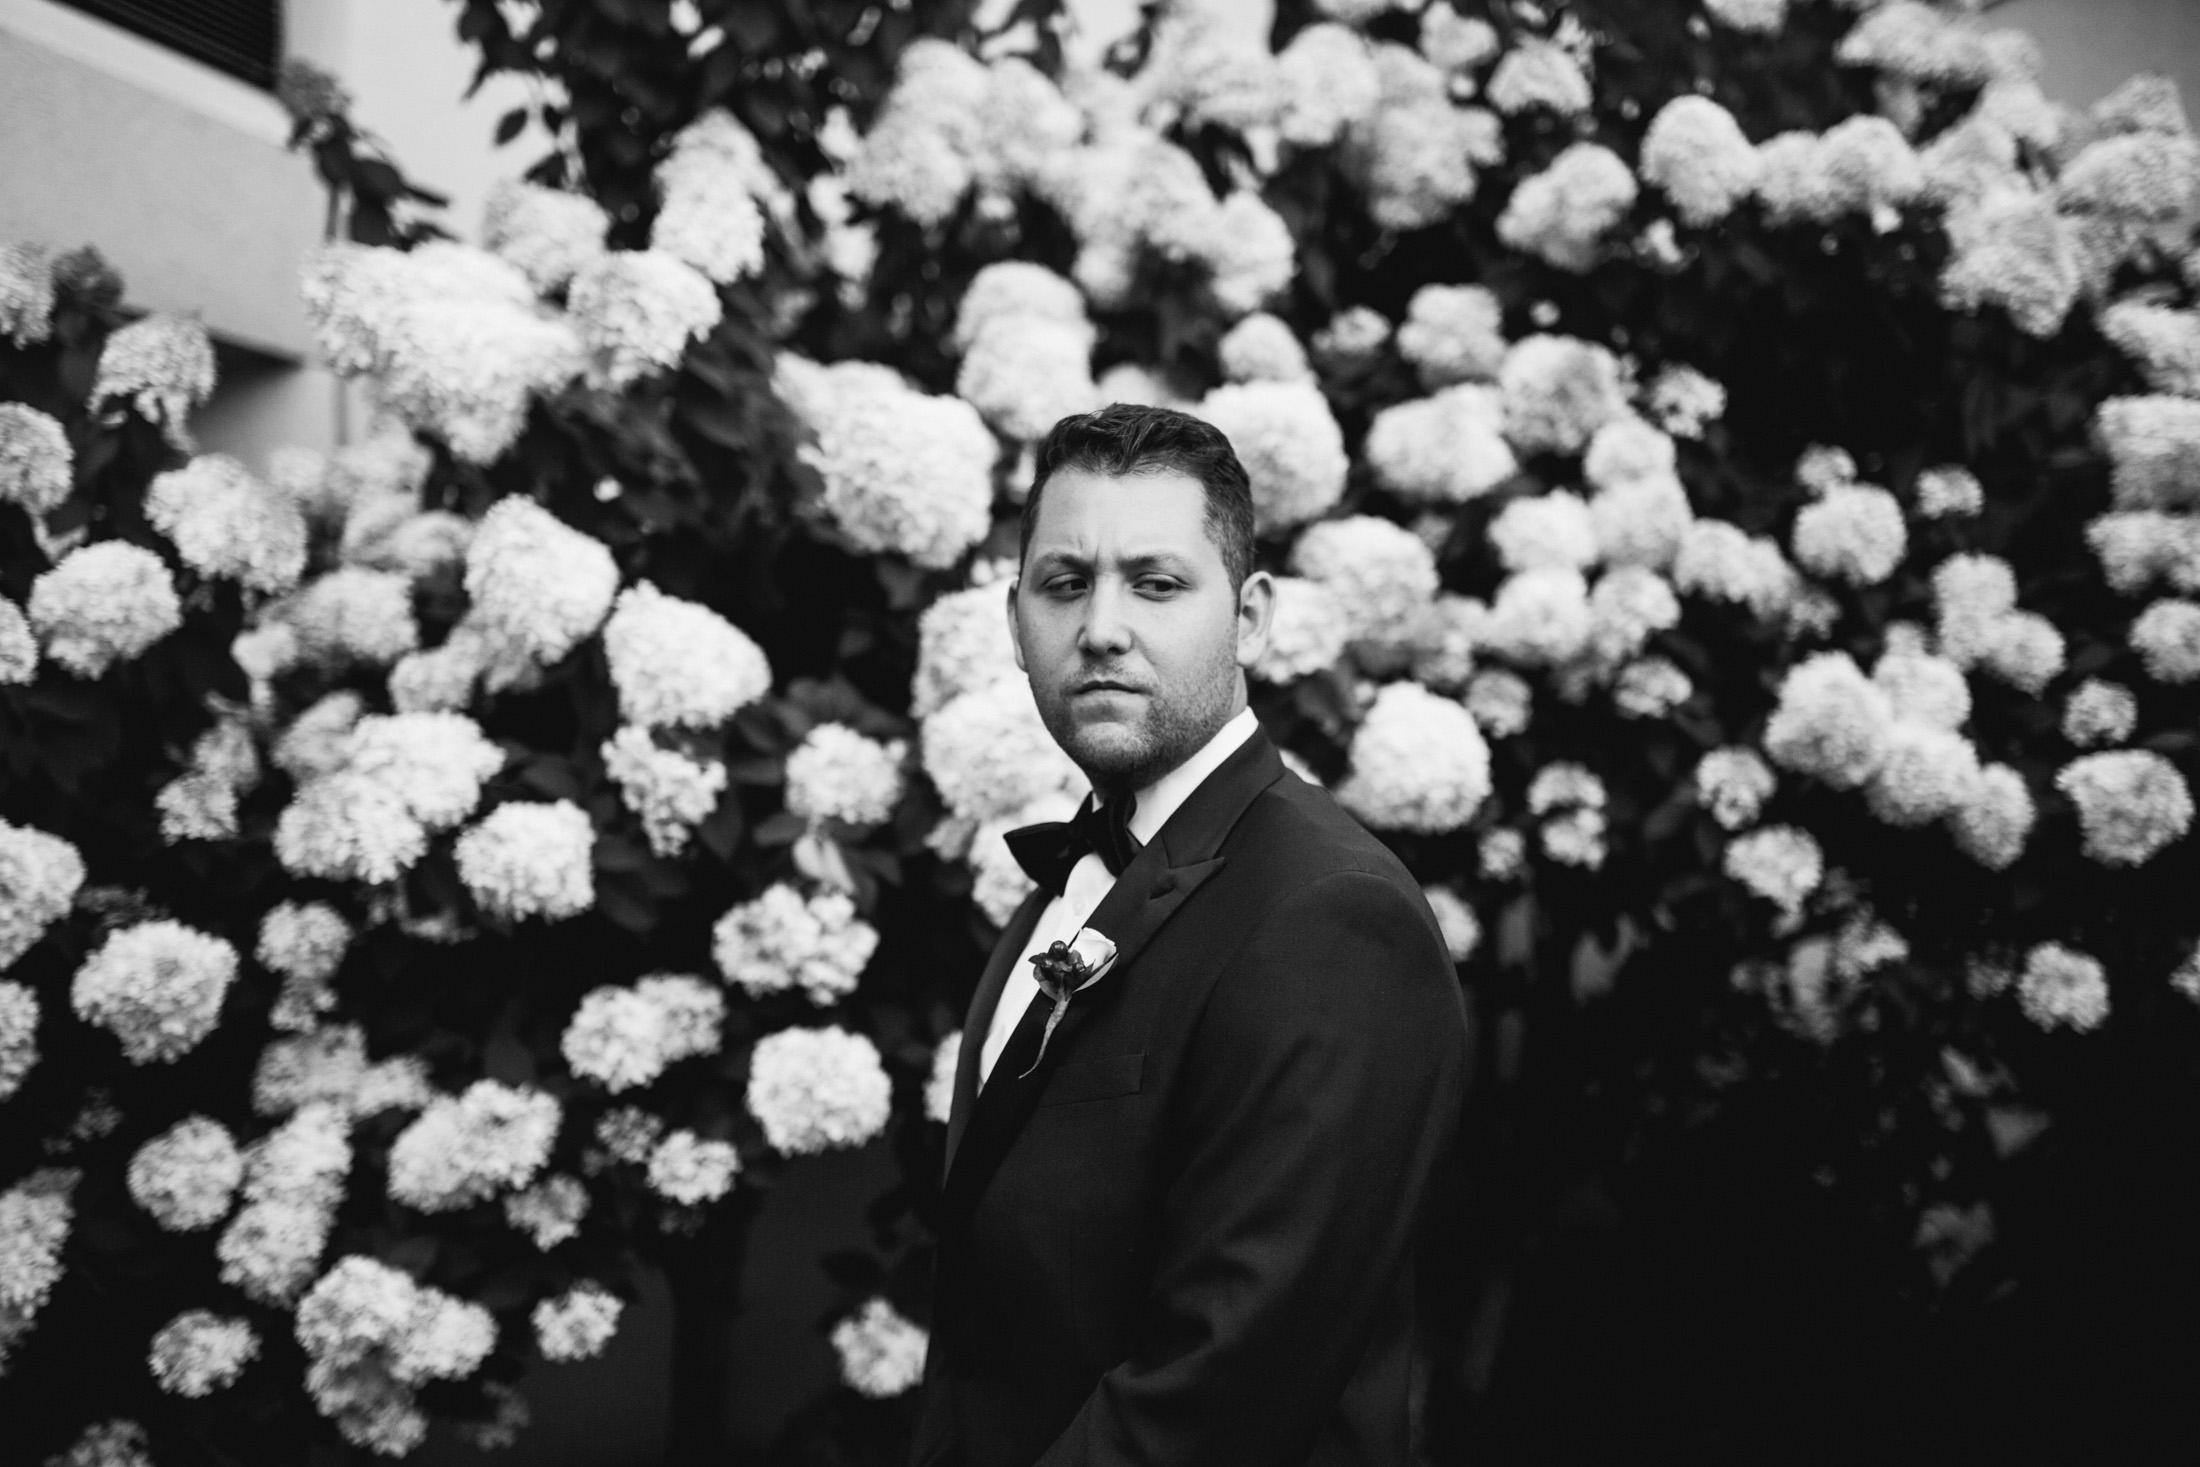 Cruiseport-Wedding-Photographer-4.jpg